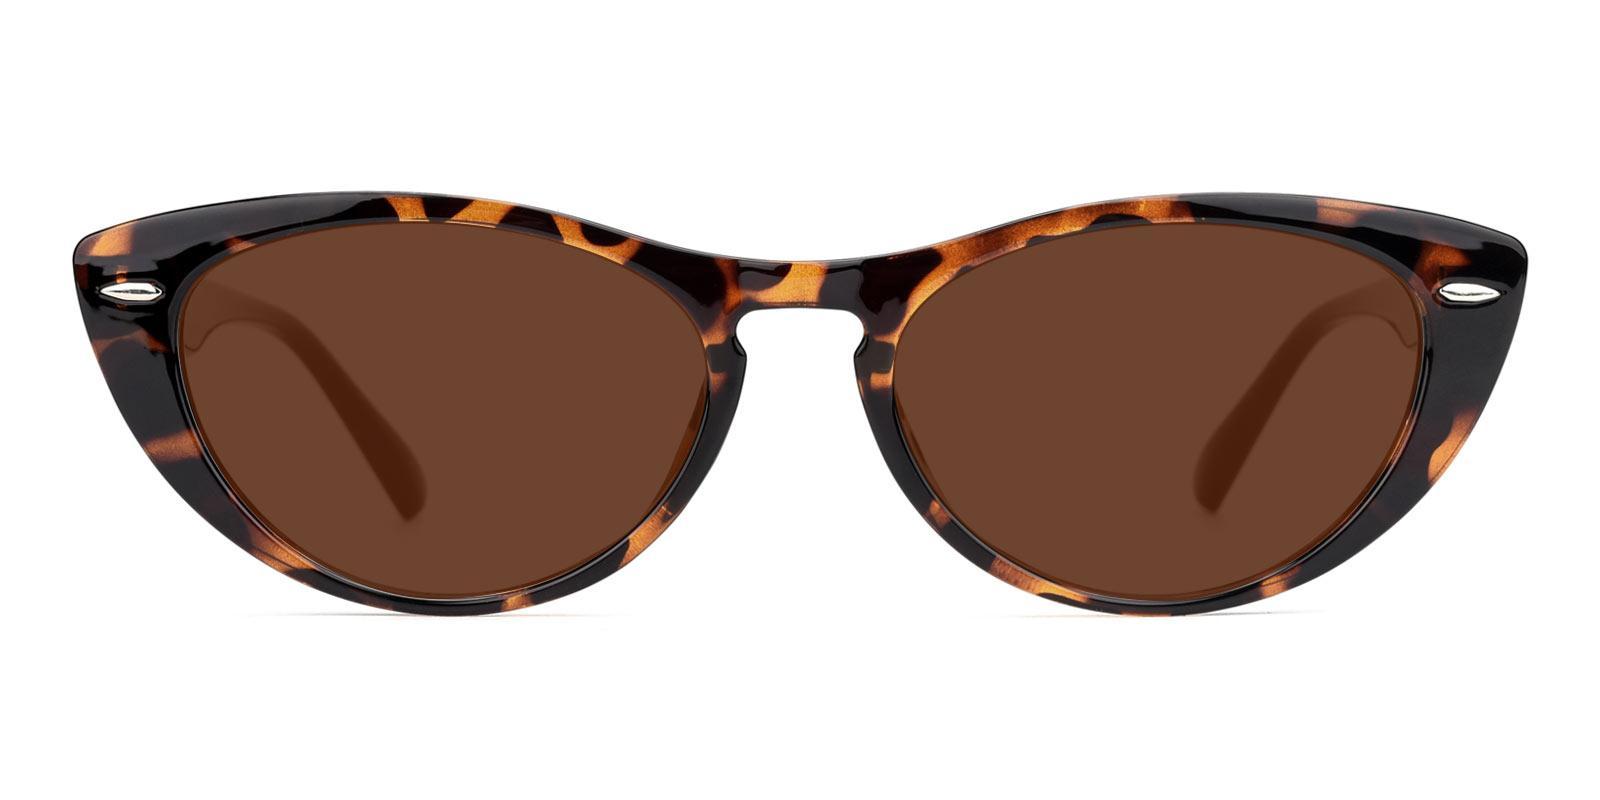 Kuku-Tortoise-Cat-TR-Sunglasses-detail